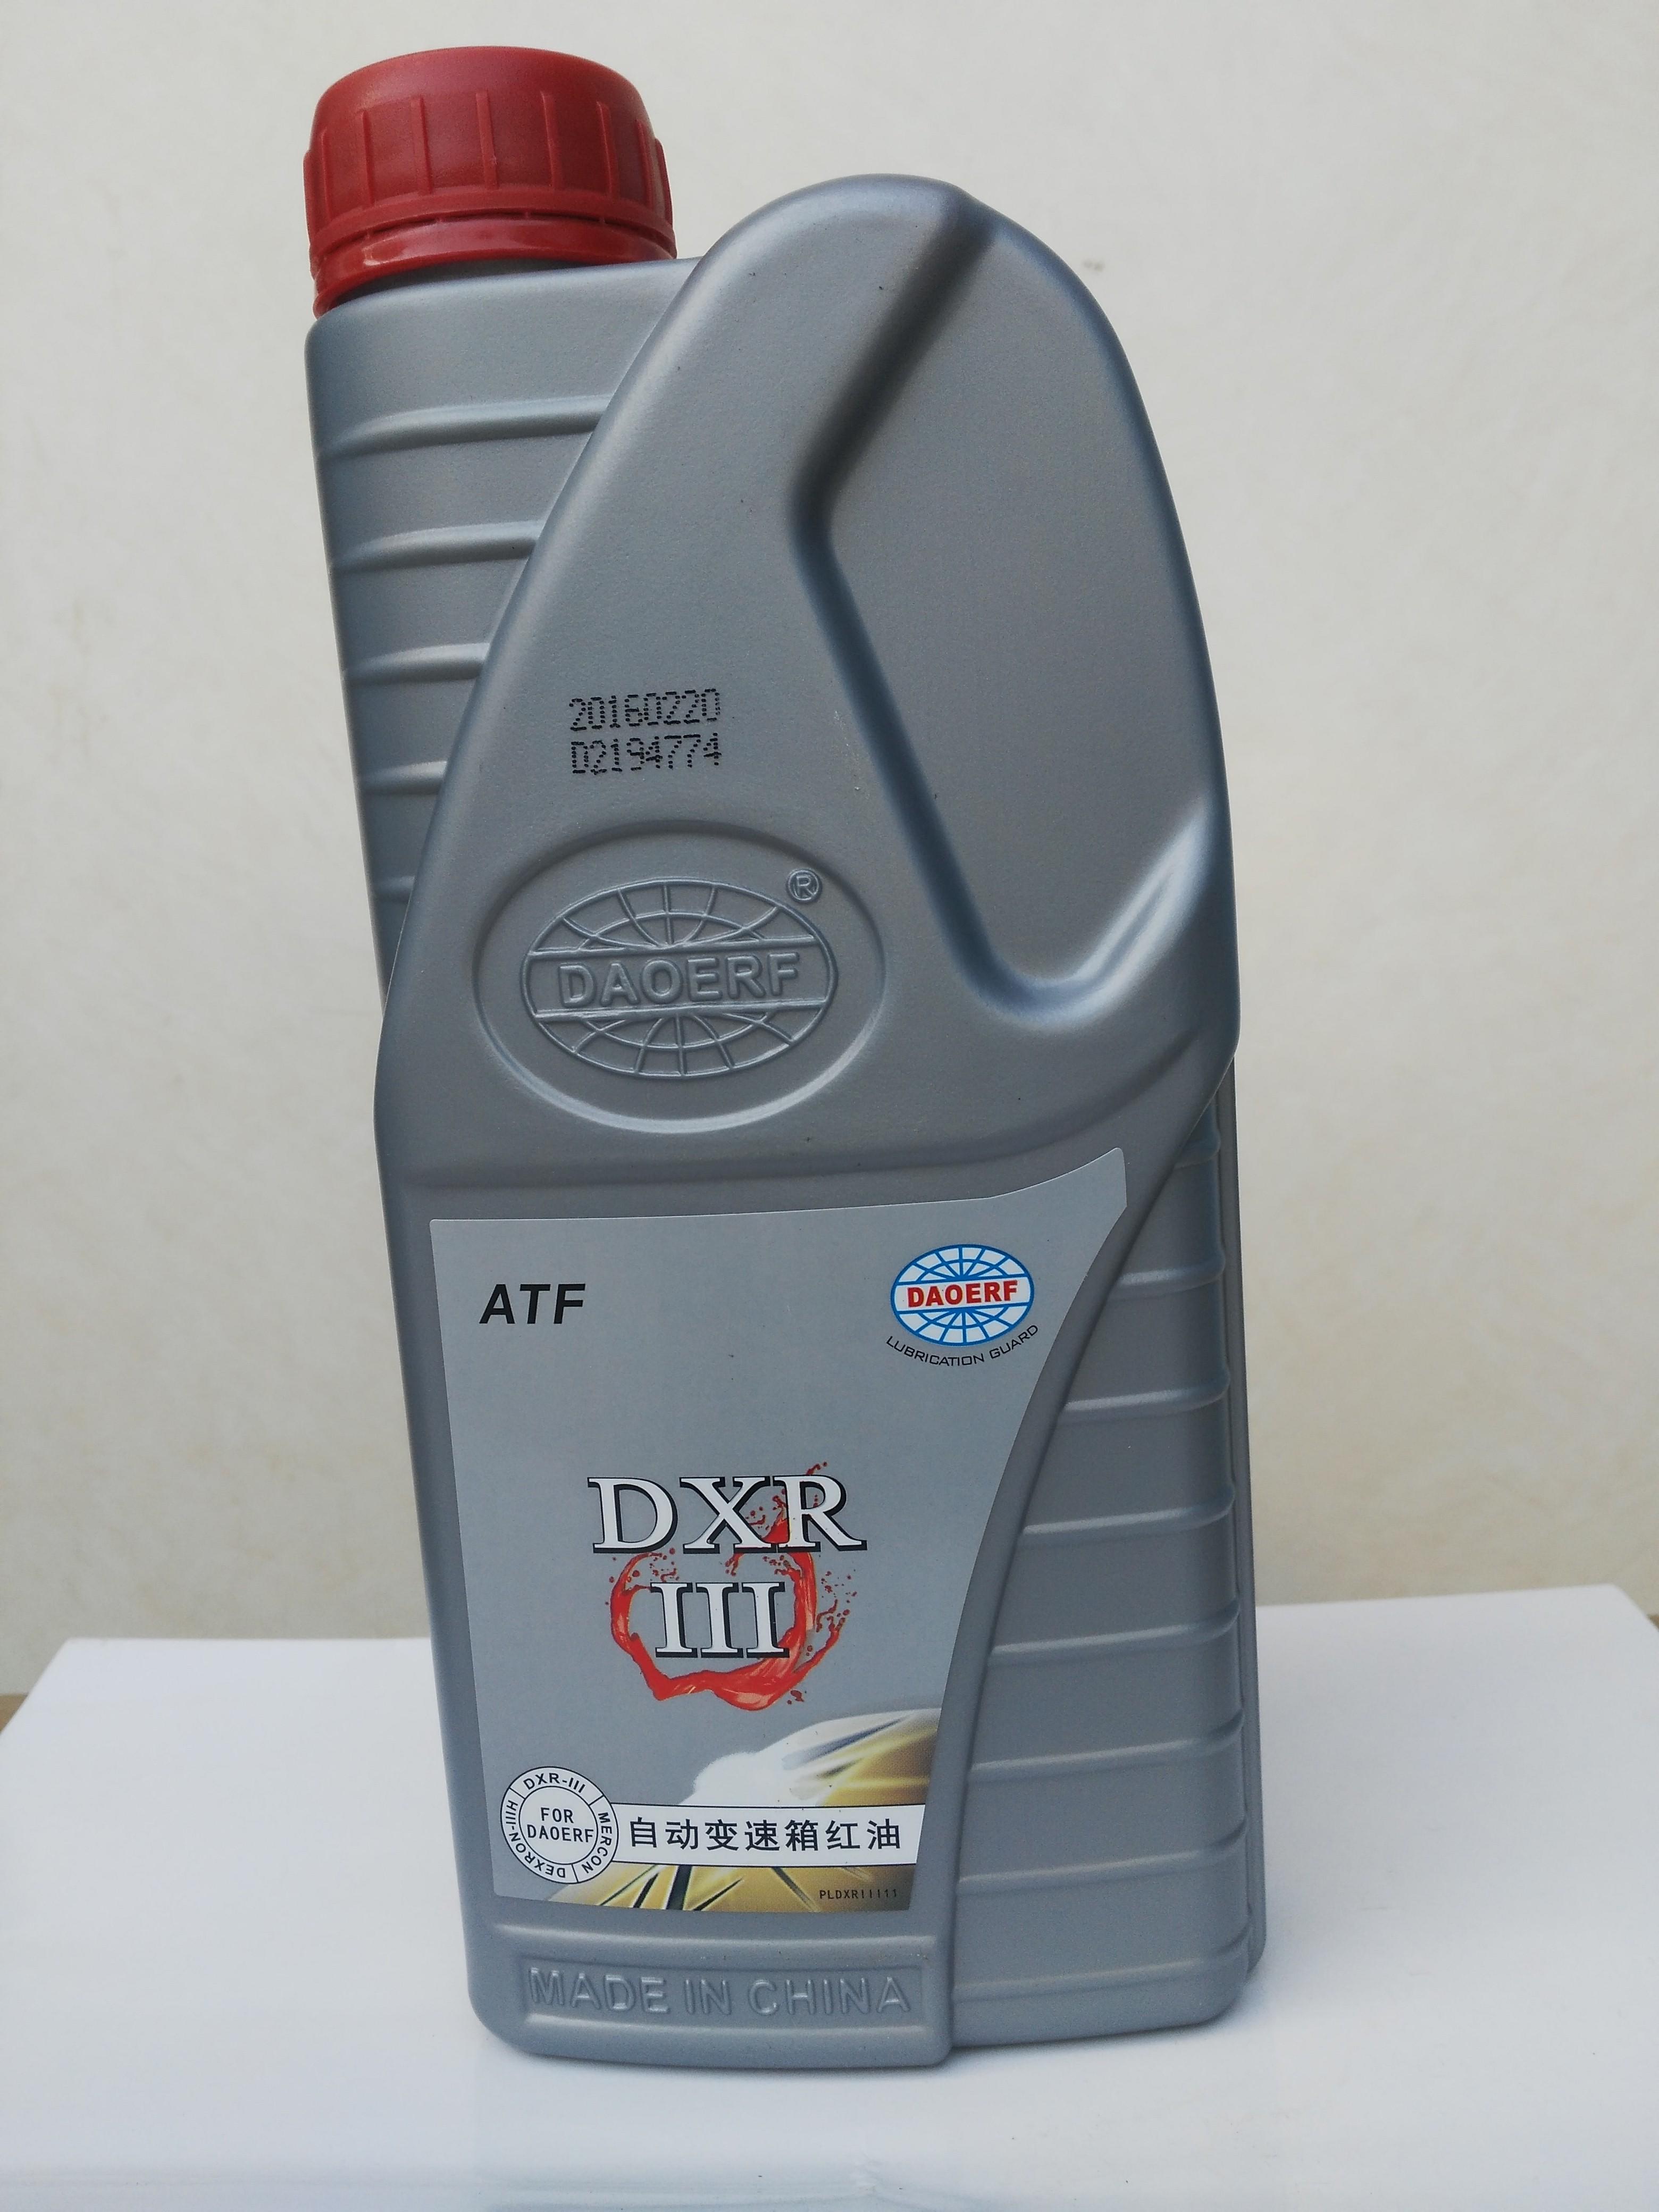 DXR-111-1自动贝博手机版红油.jpg